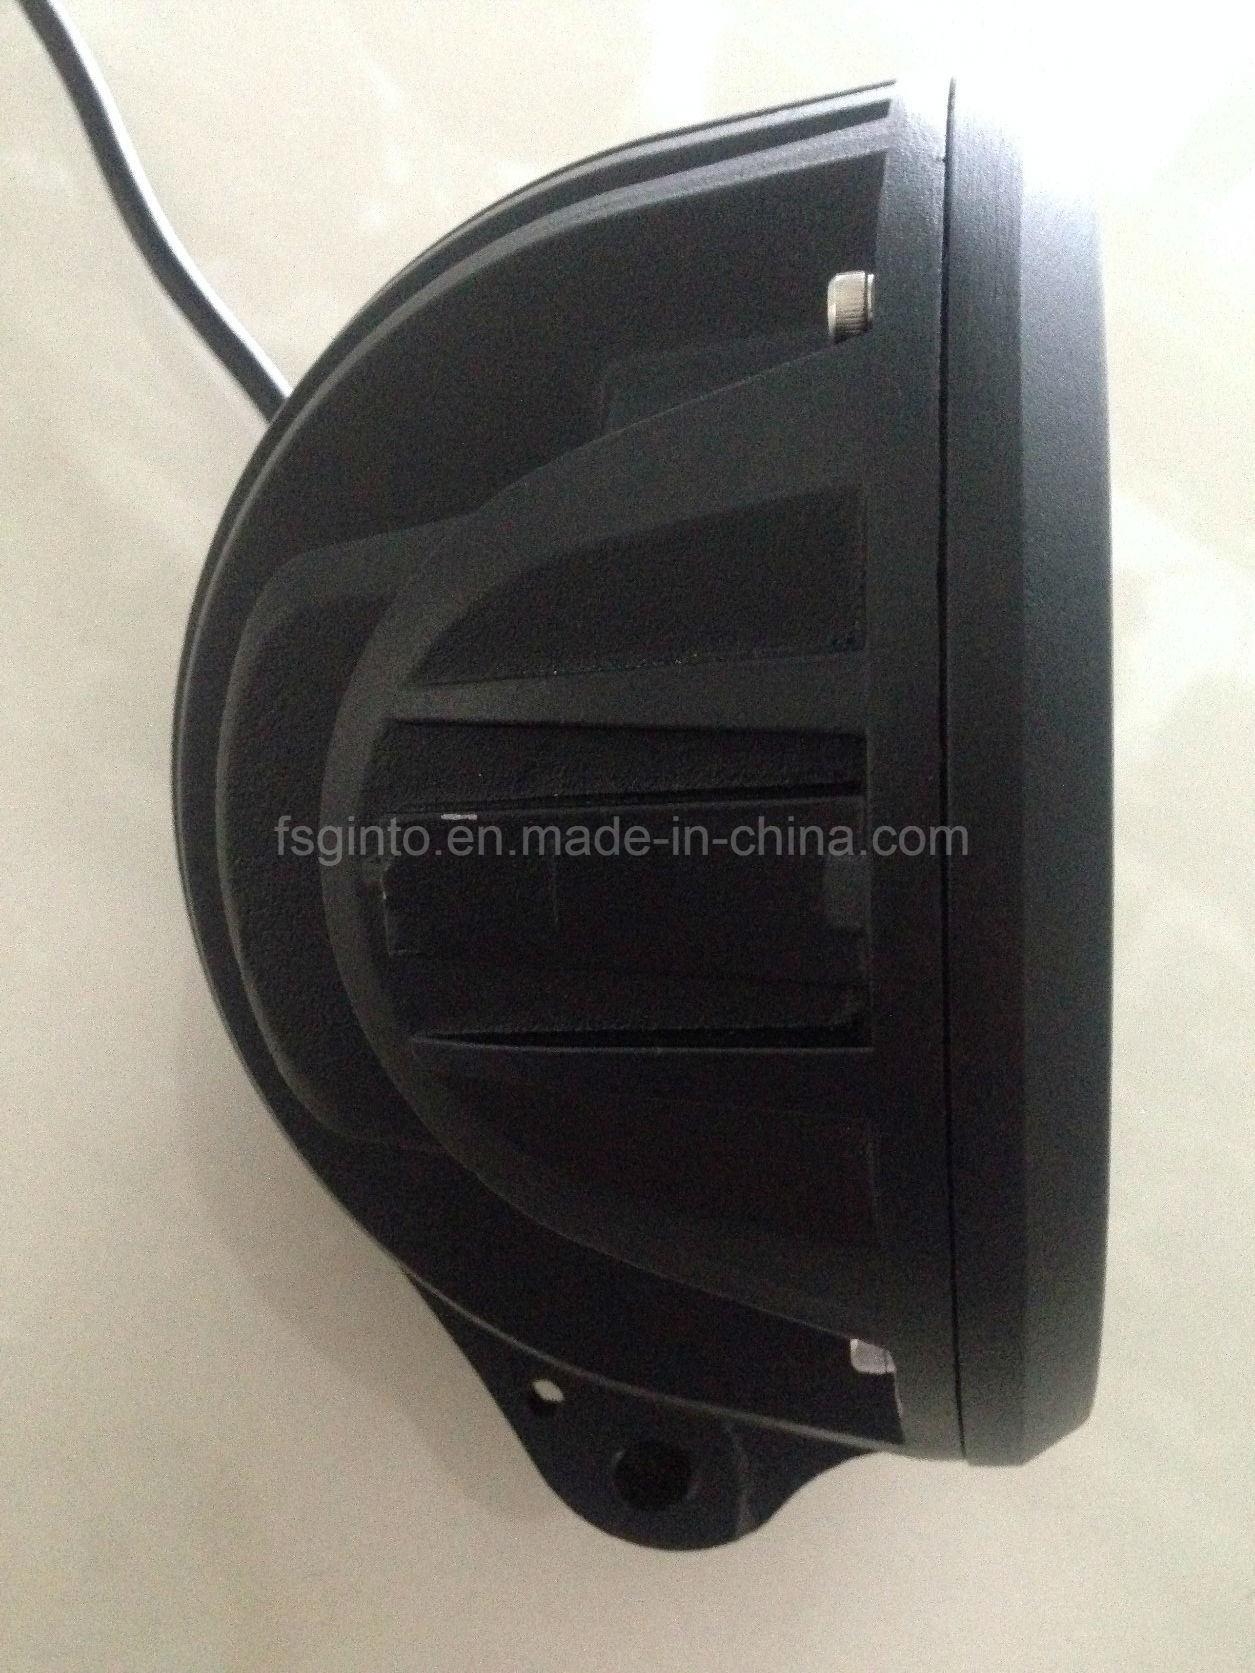 6inch Round Offroad 4X4 70W LED Work Light (GT1025-70W)